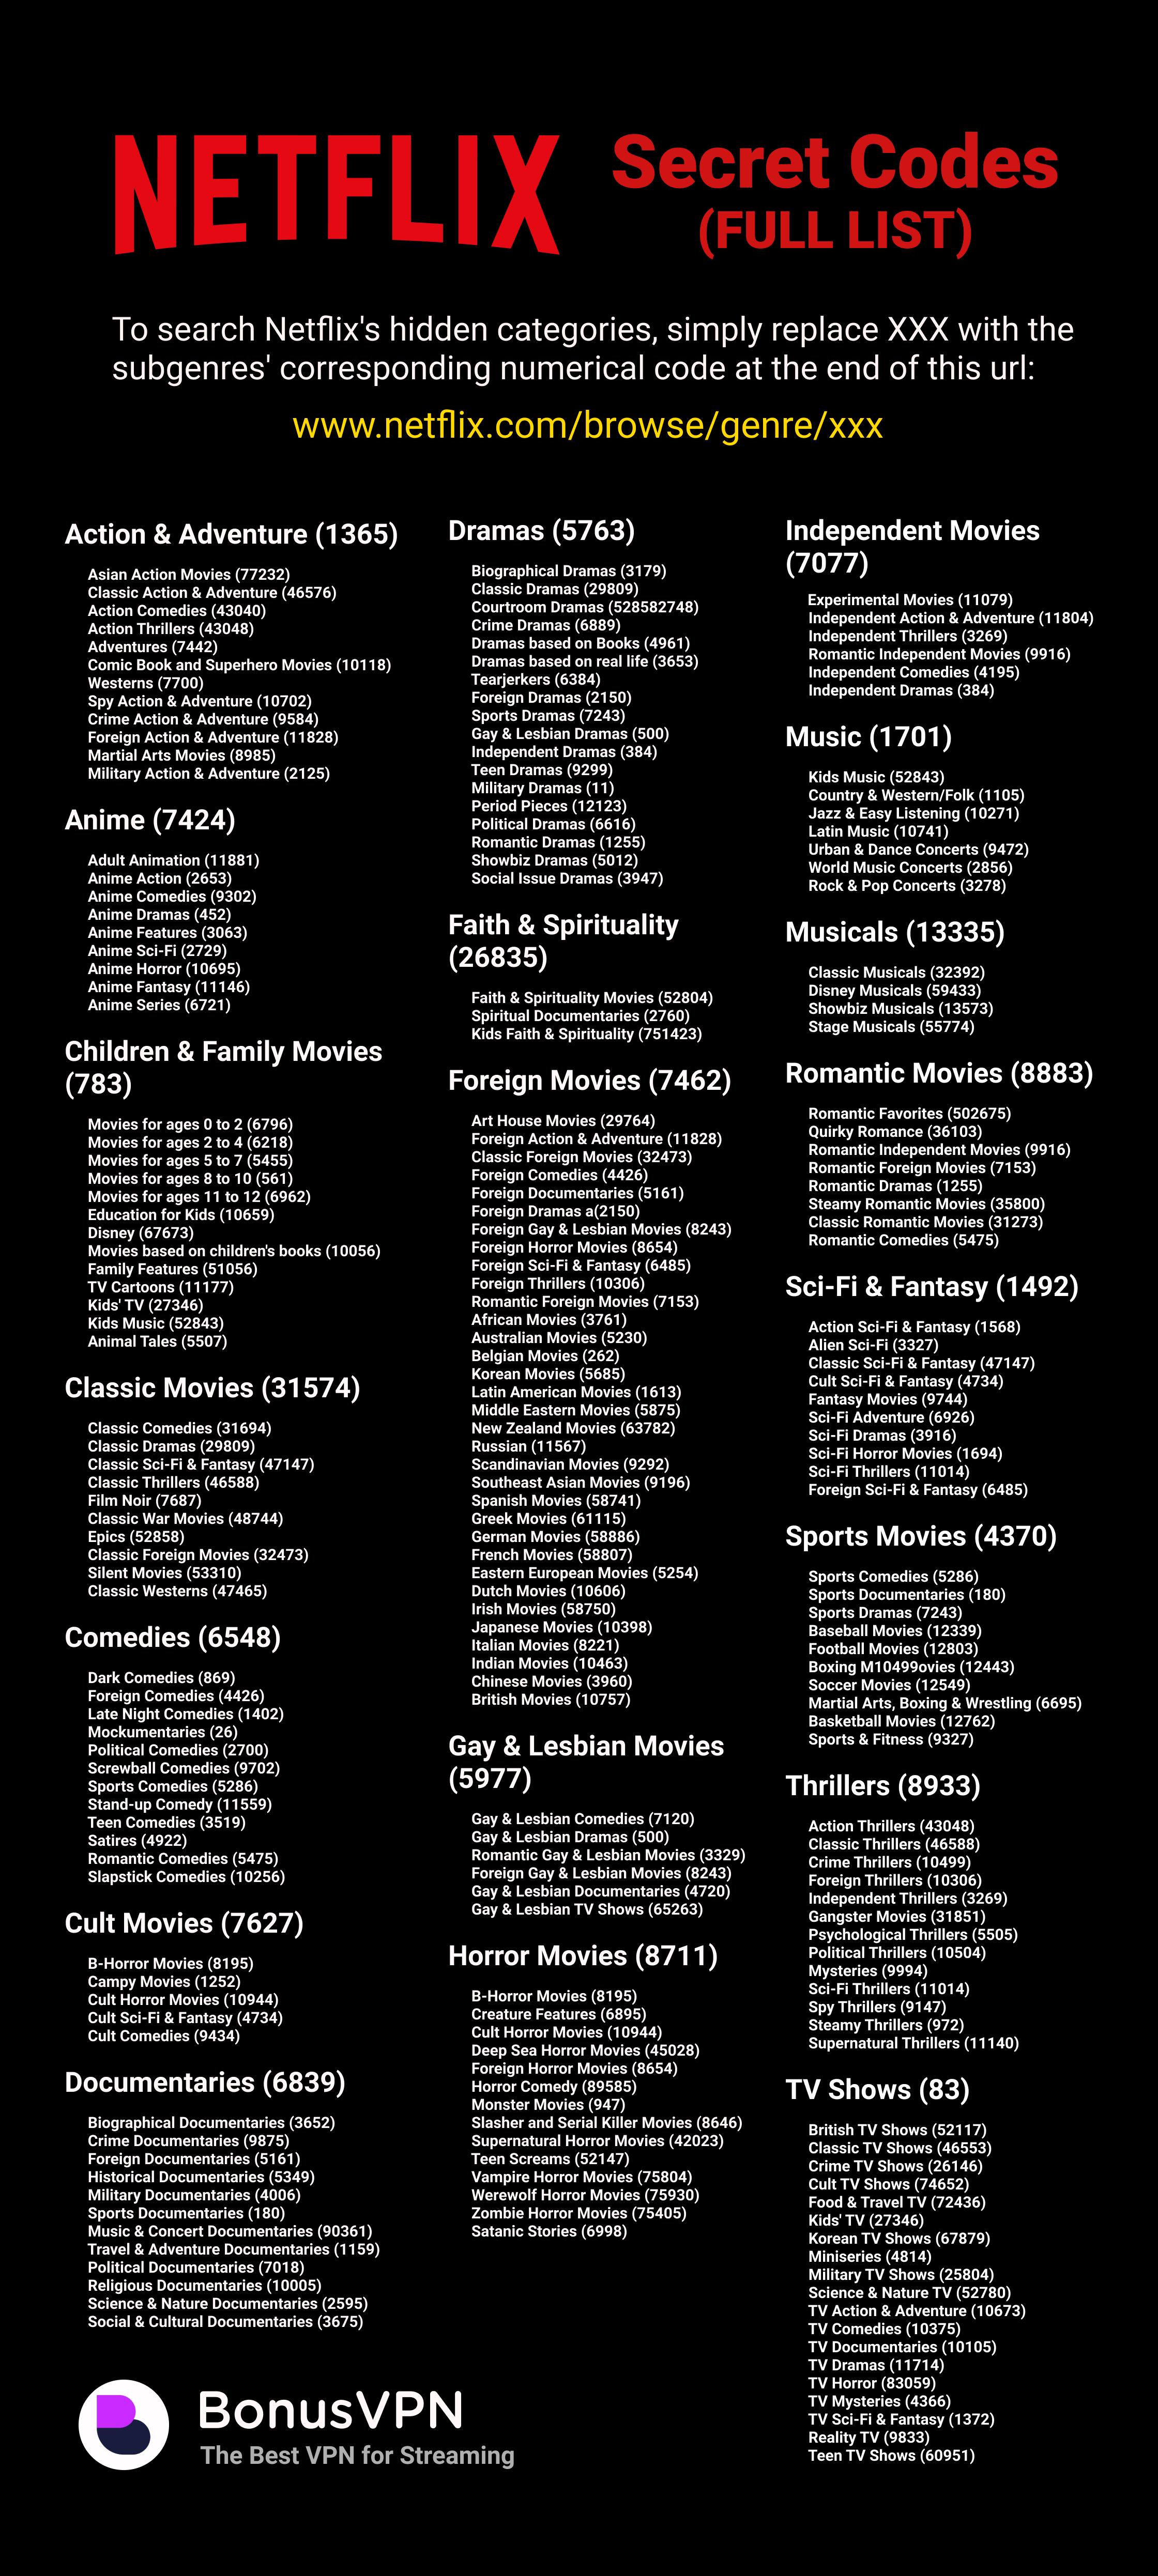 netflix tajne kody ukryte kategorie